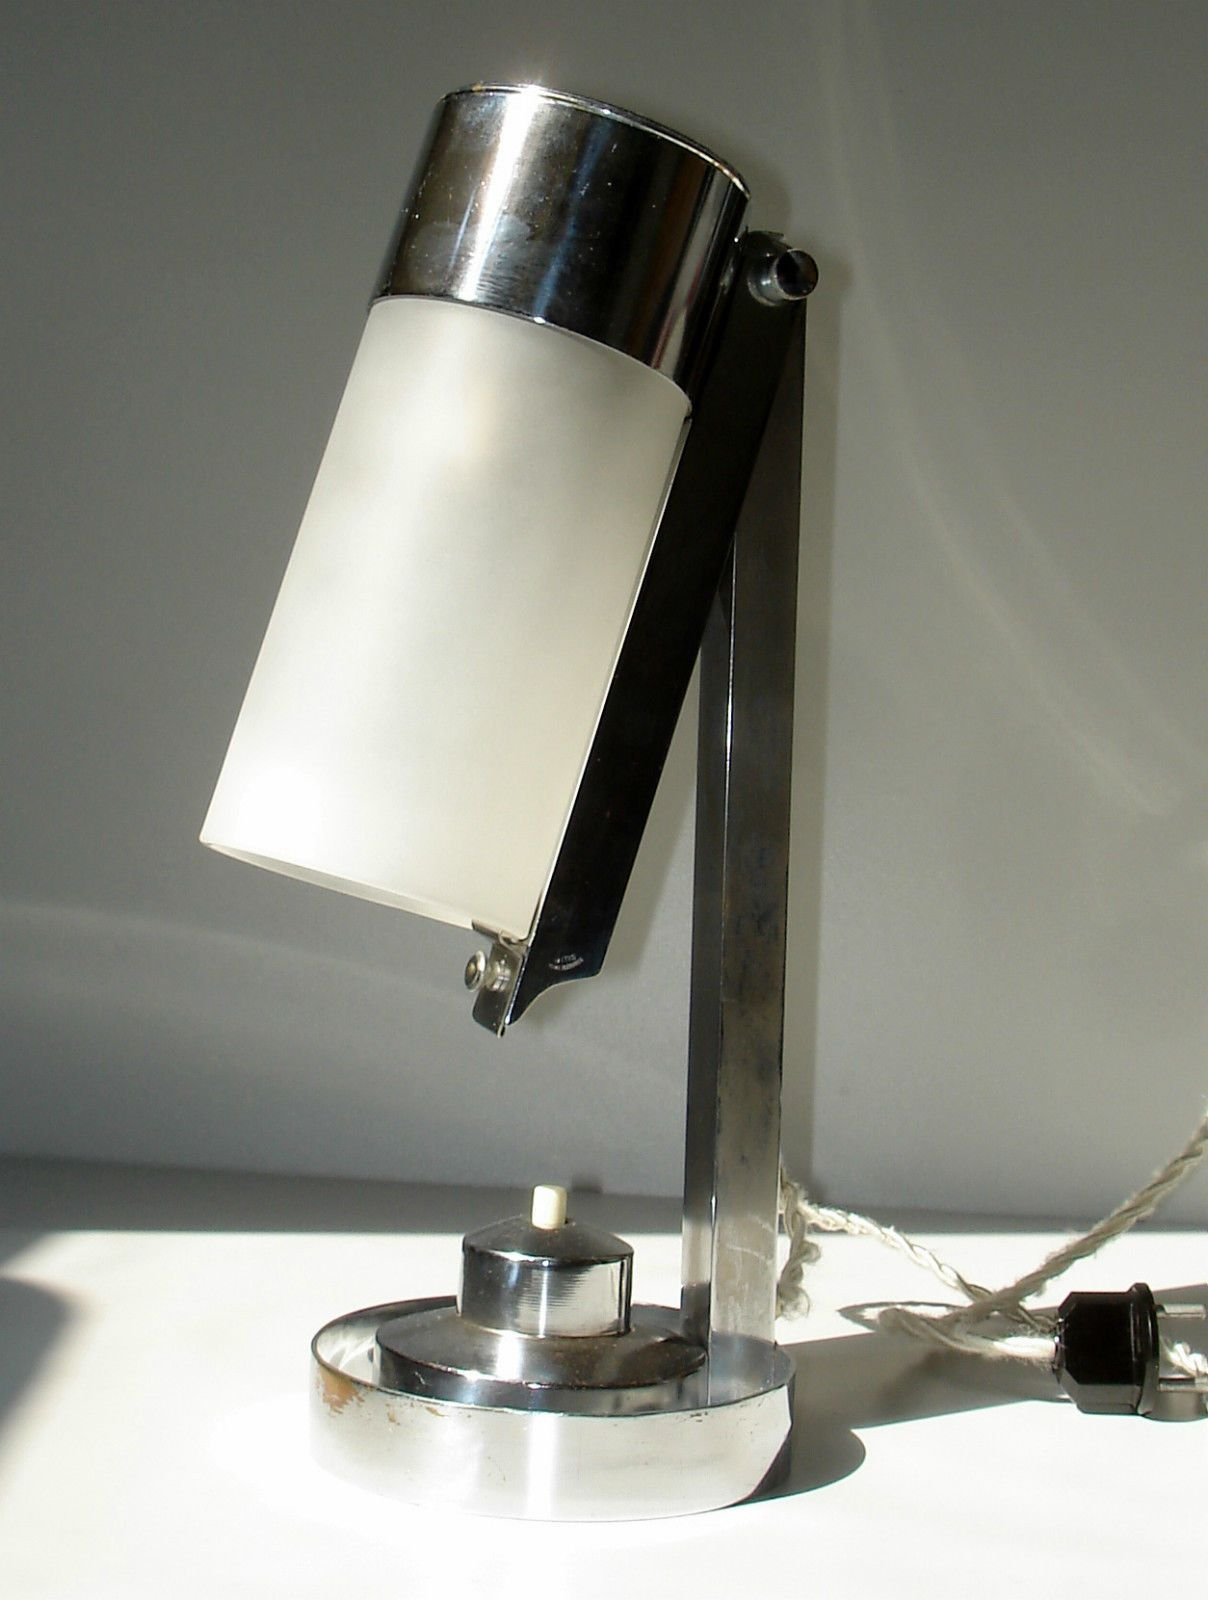 Bauhaus art deco modernist table lamp boris lacroix mitis tischlampe lampe 1930 ebay